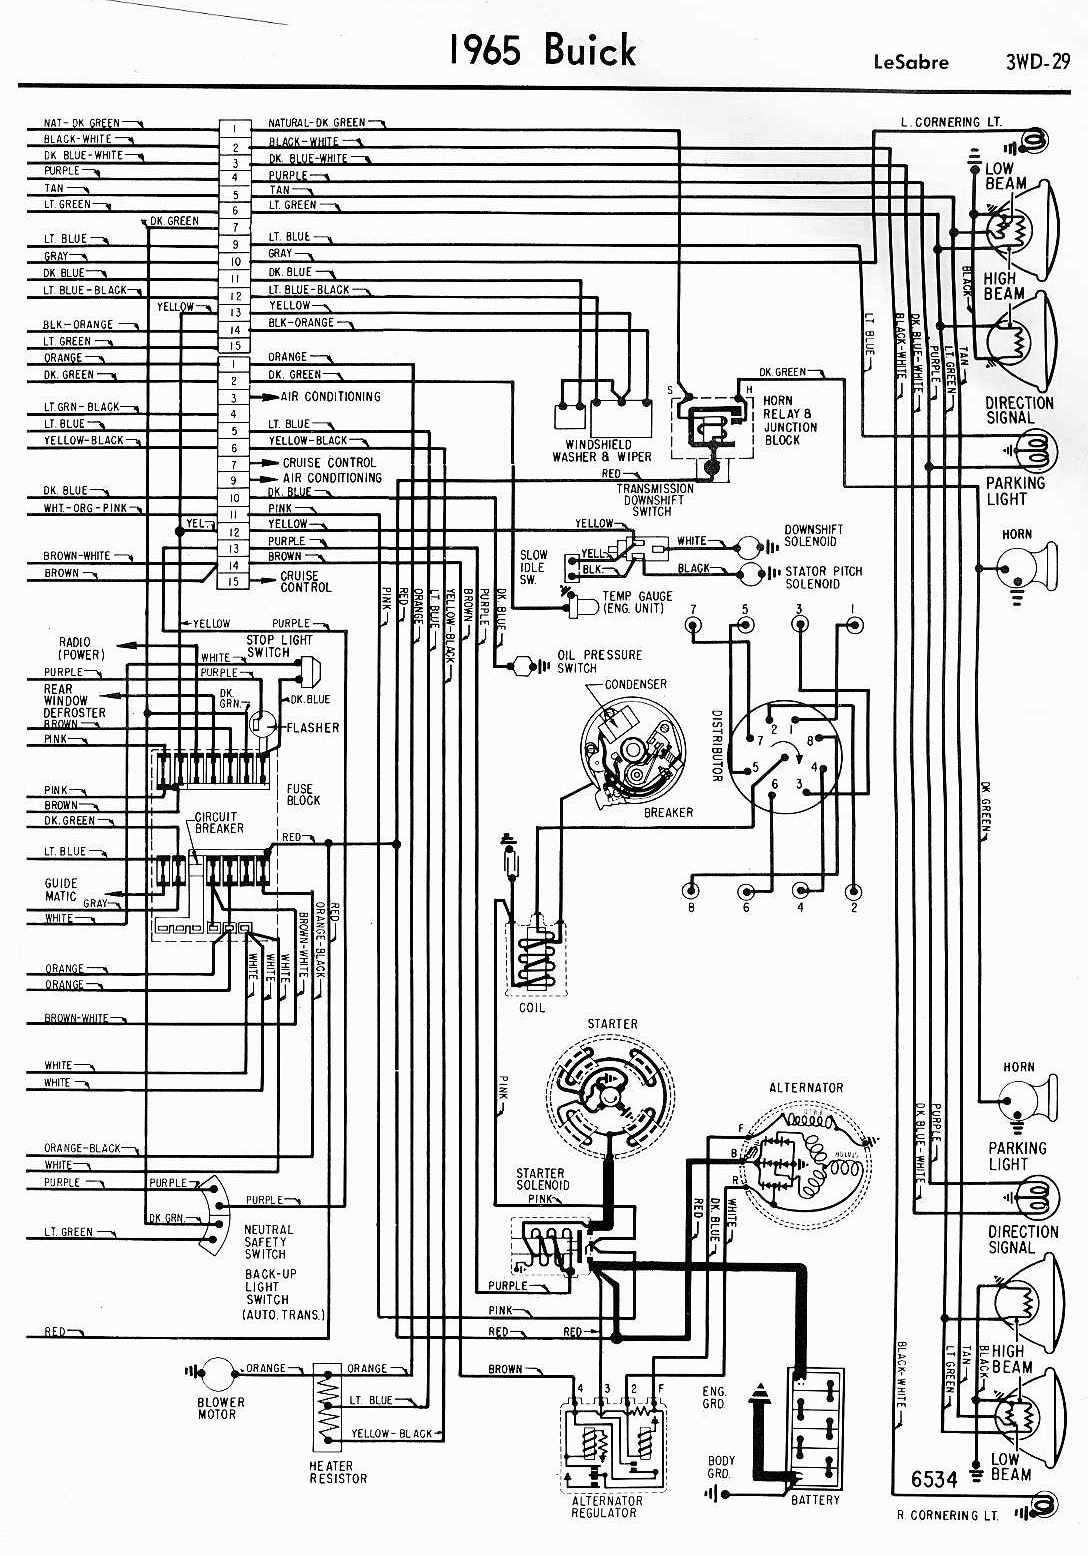 Buick Car Pdf Manual Wiring Diagram